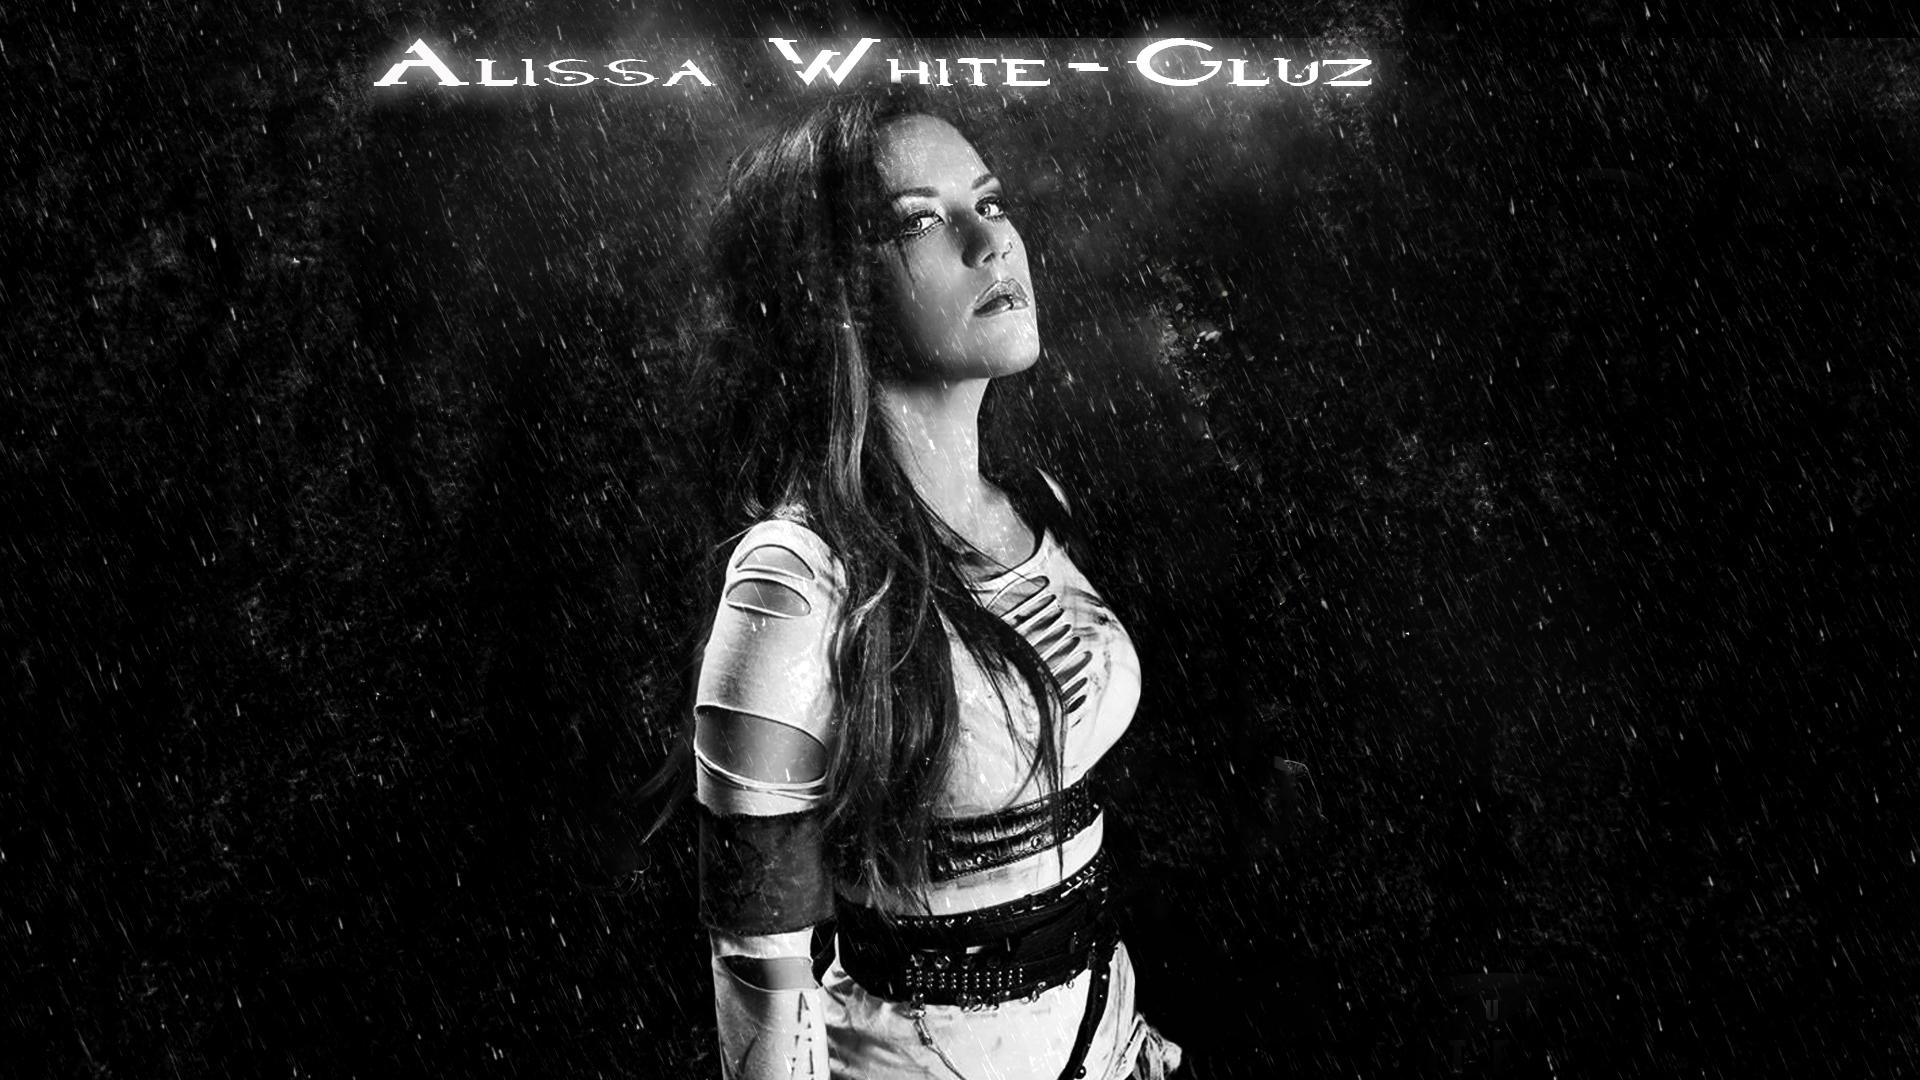 Alissa White Gluz by FunkyCop999 on DeviantArt